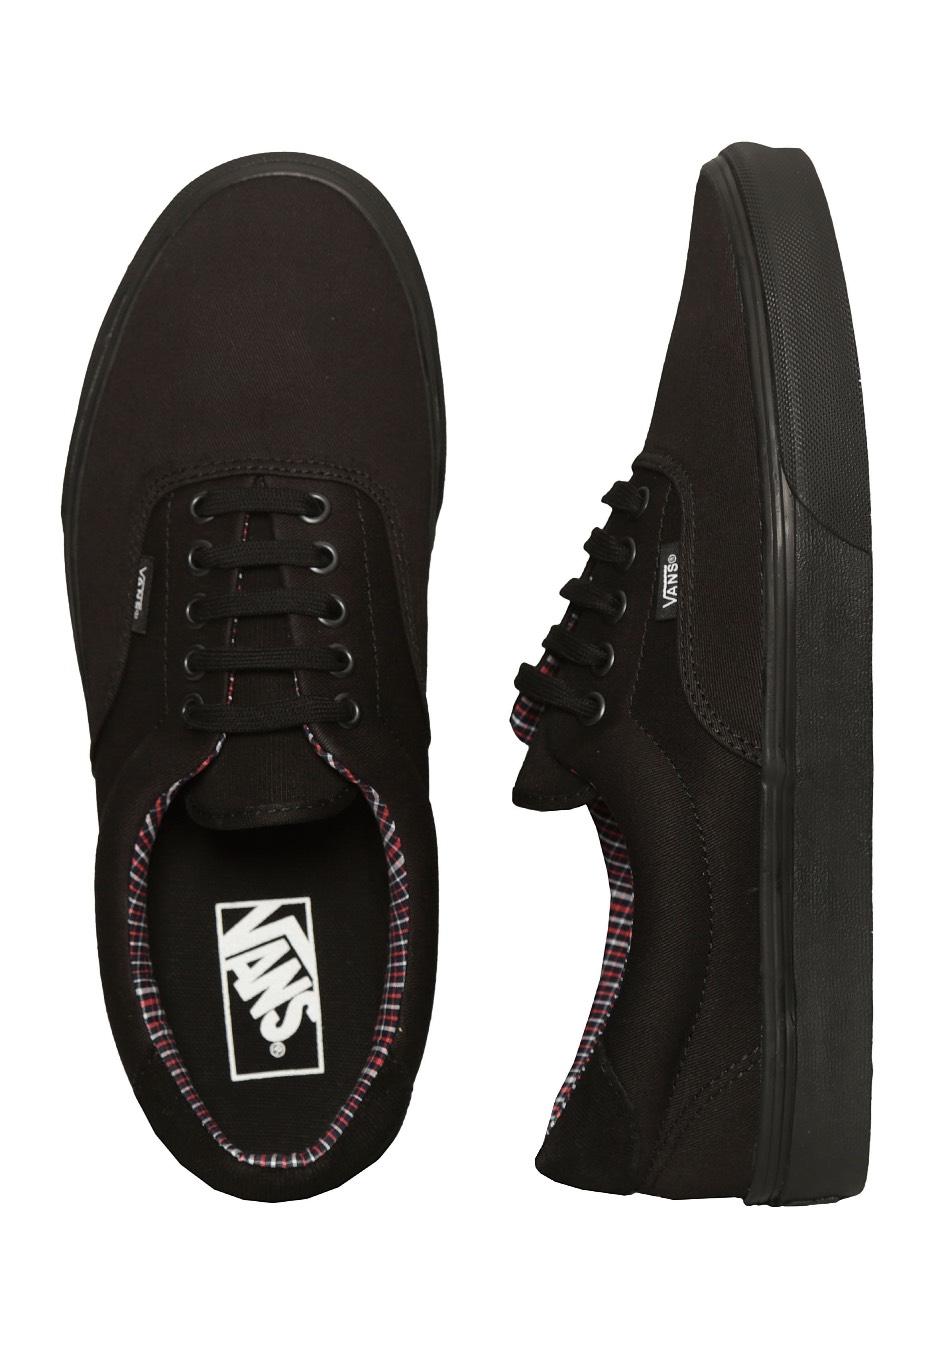 Vans - Era 59 Cord   Plaid Black Black - Shoes - Impericon.com UK 629d8f35c2